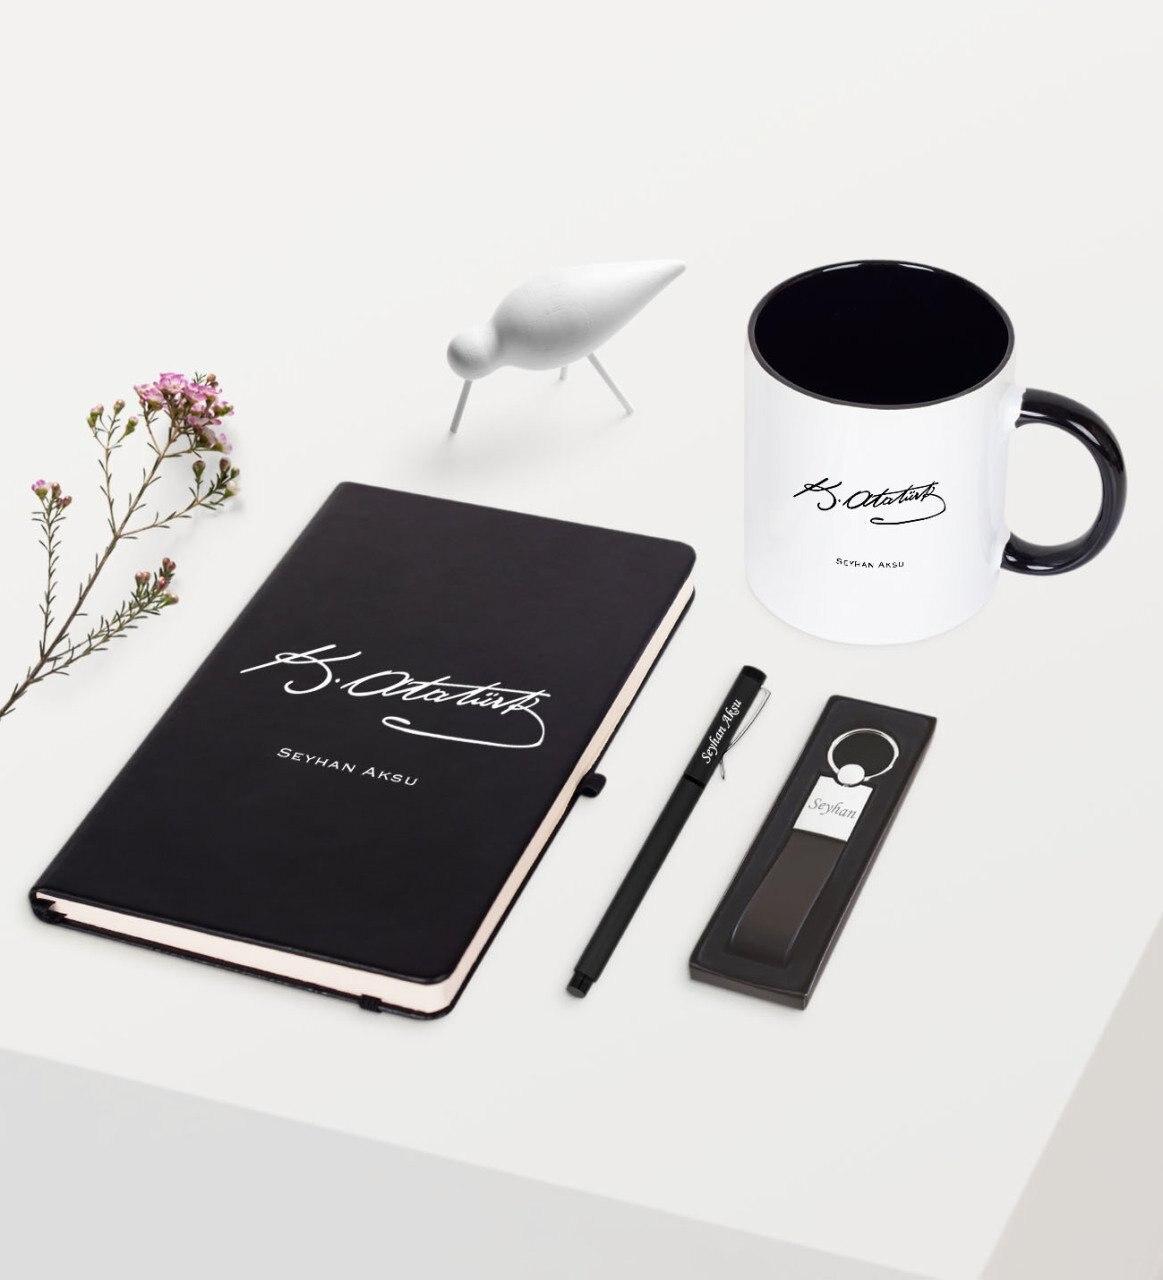 Personalized Ataturk Themed Black Notebook Pen Keychain Mug Set-6